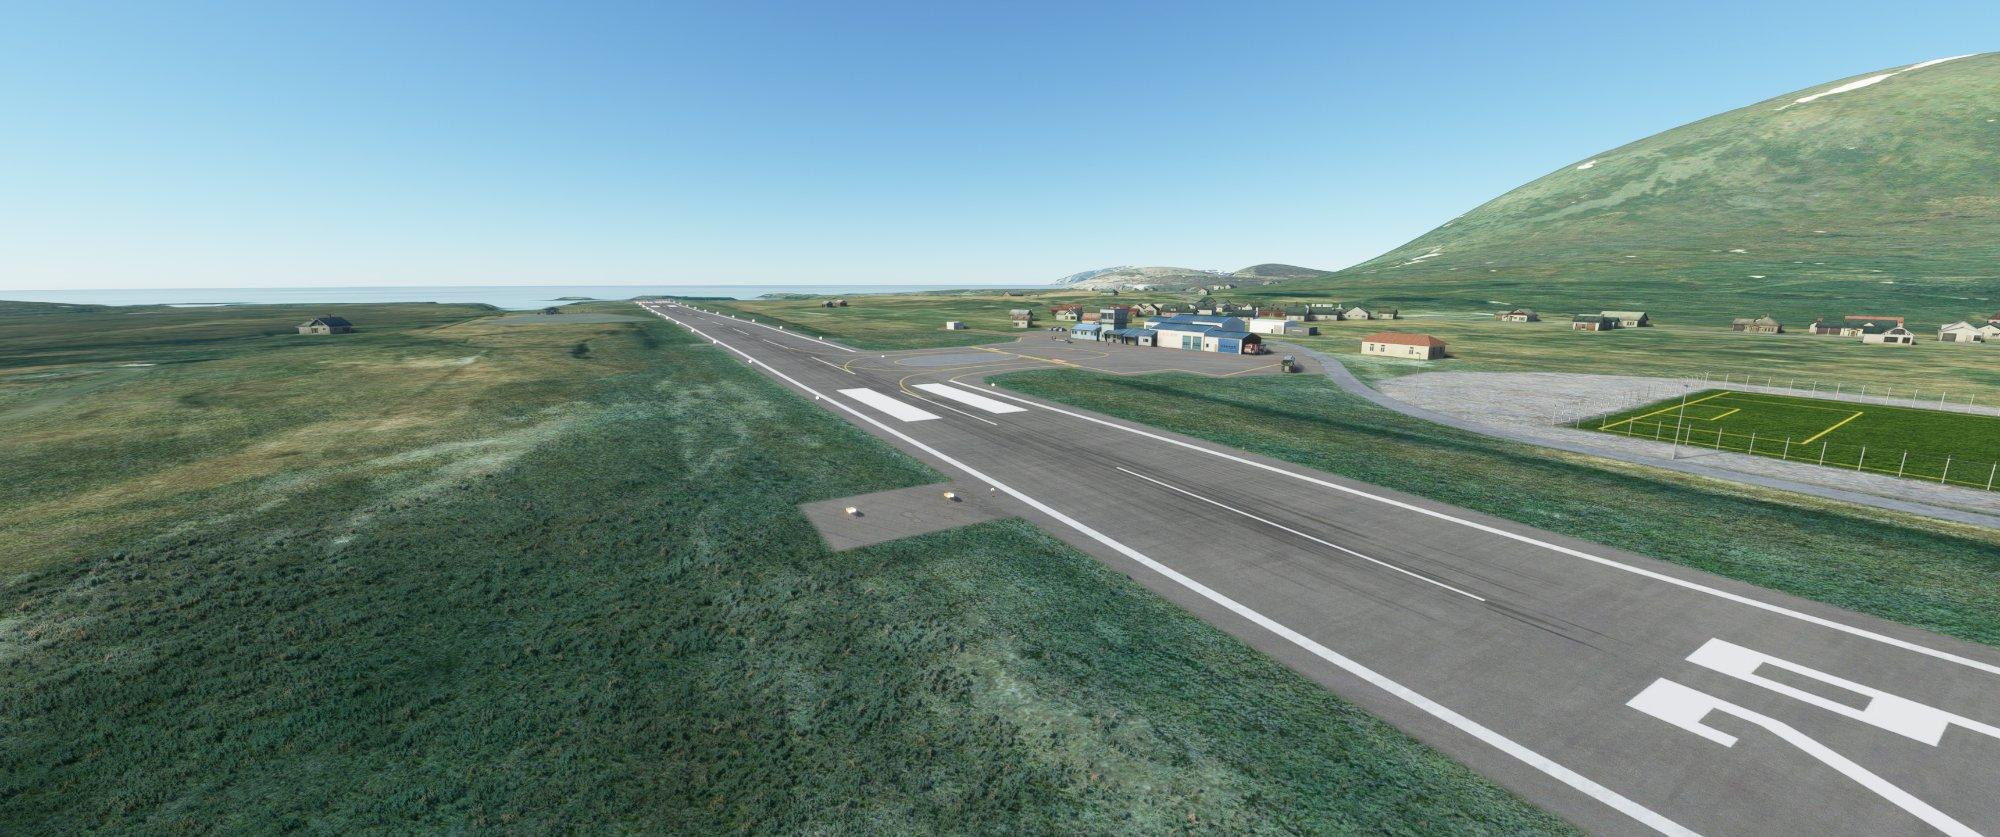 Microsoft Flight Simulator Screenshot 2021.04.27 - 18.07.25.12.jpg